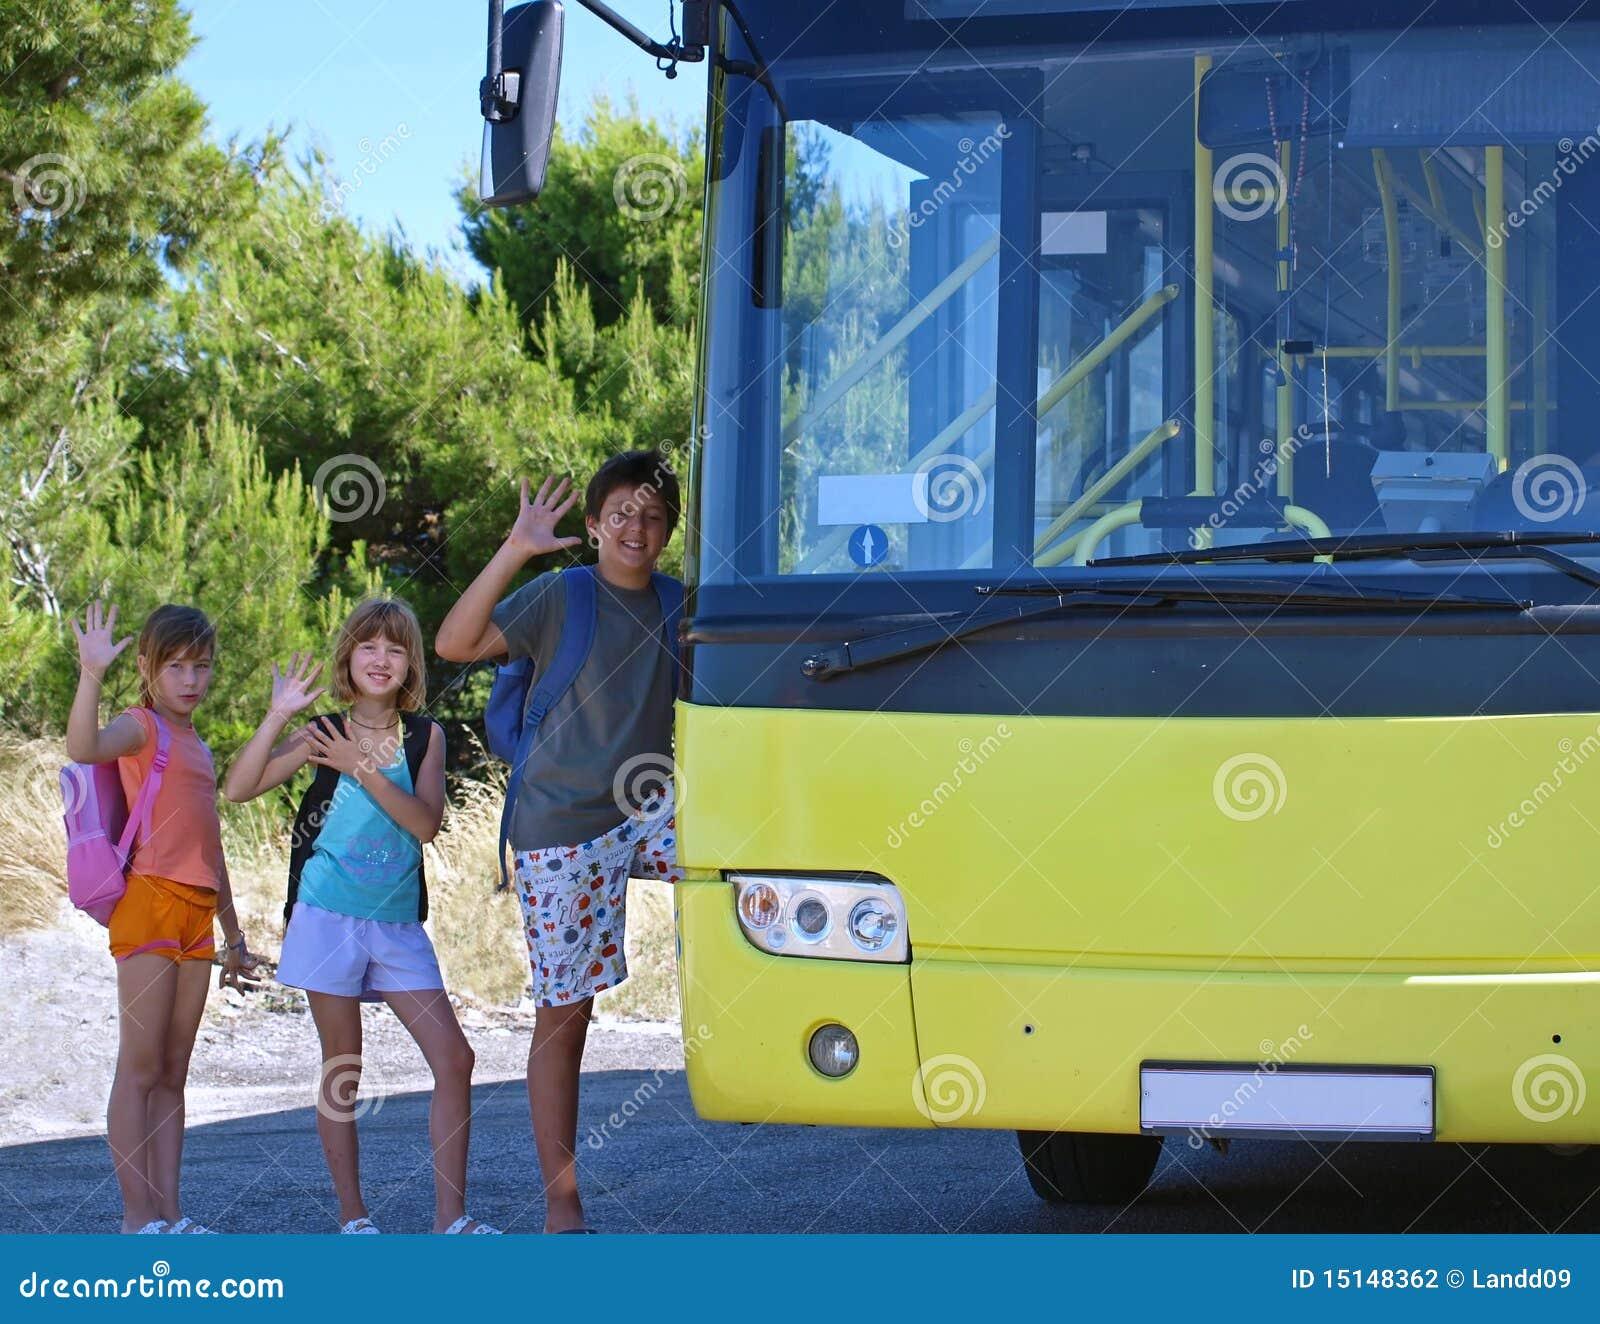 Children and yellow school bus